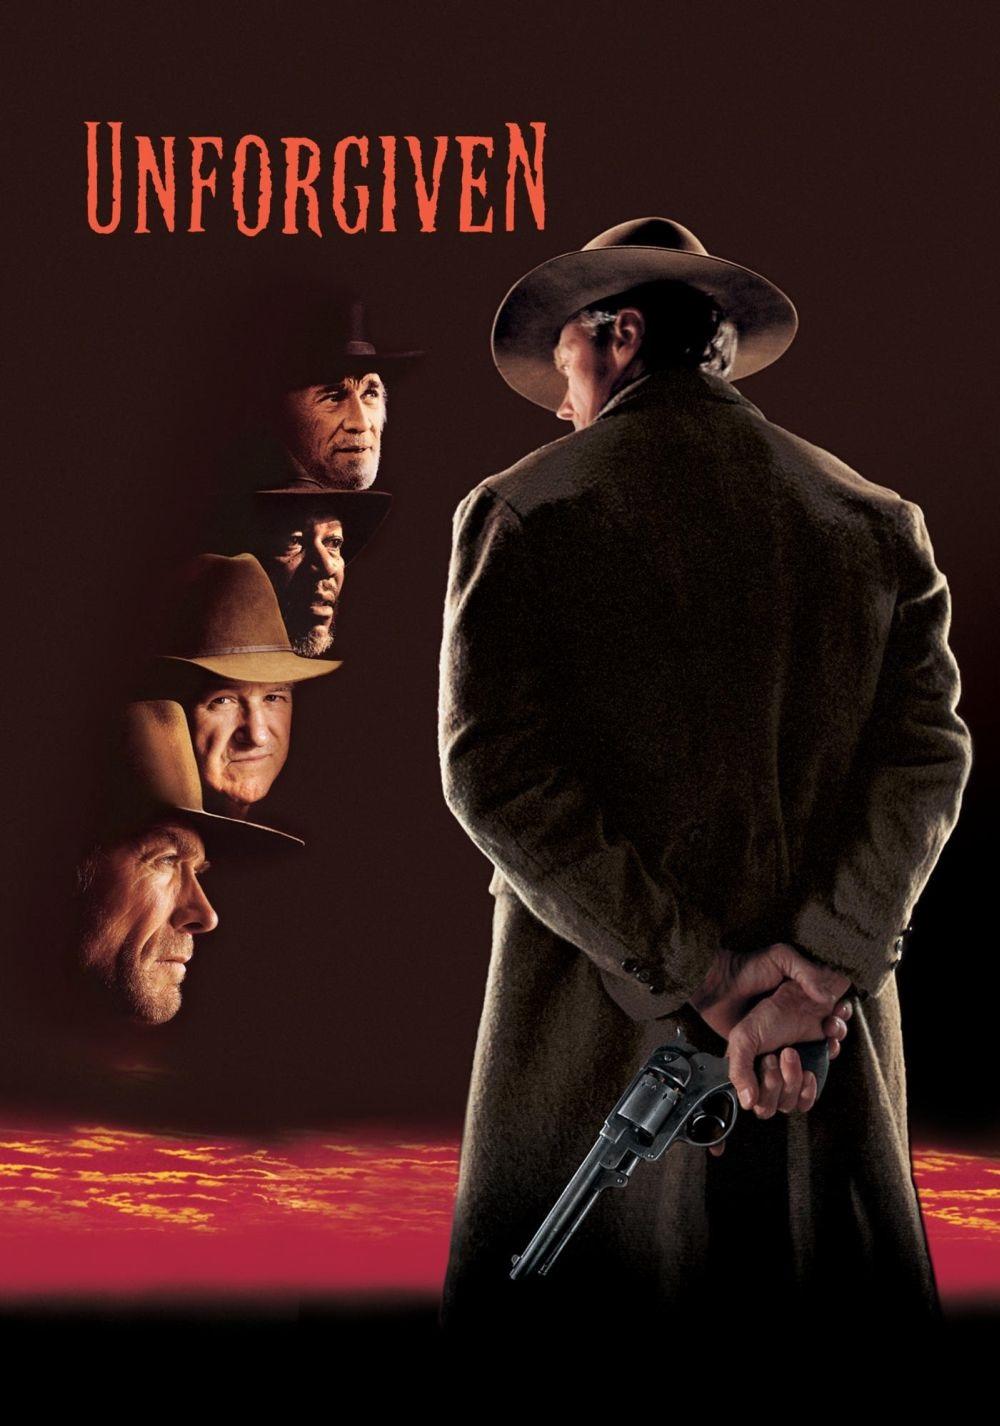 Unforgiven Poster Unforgiven | Movie fan...